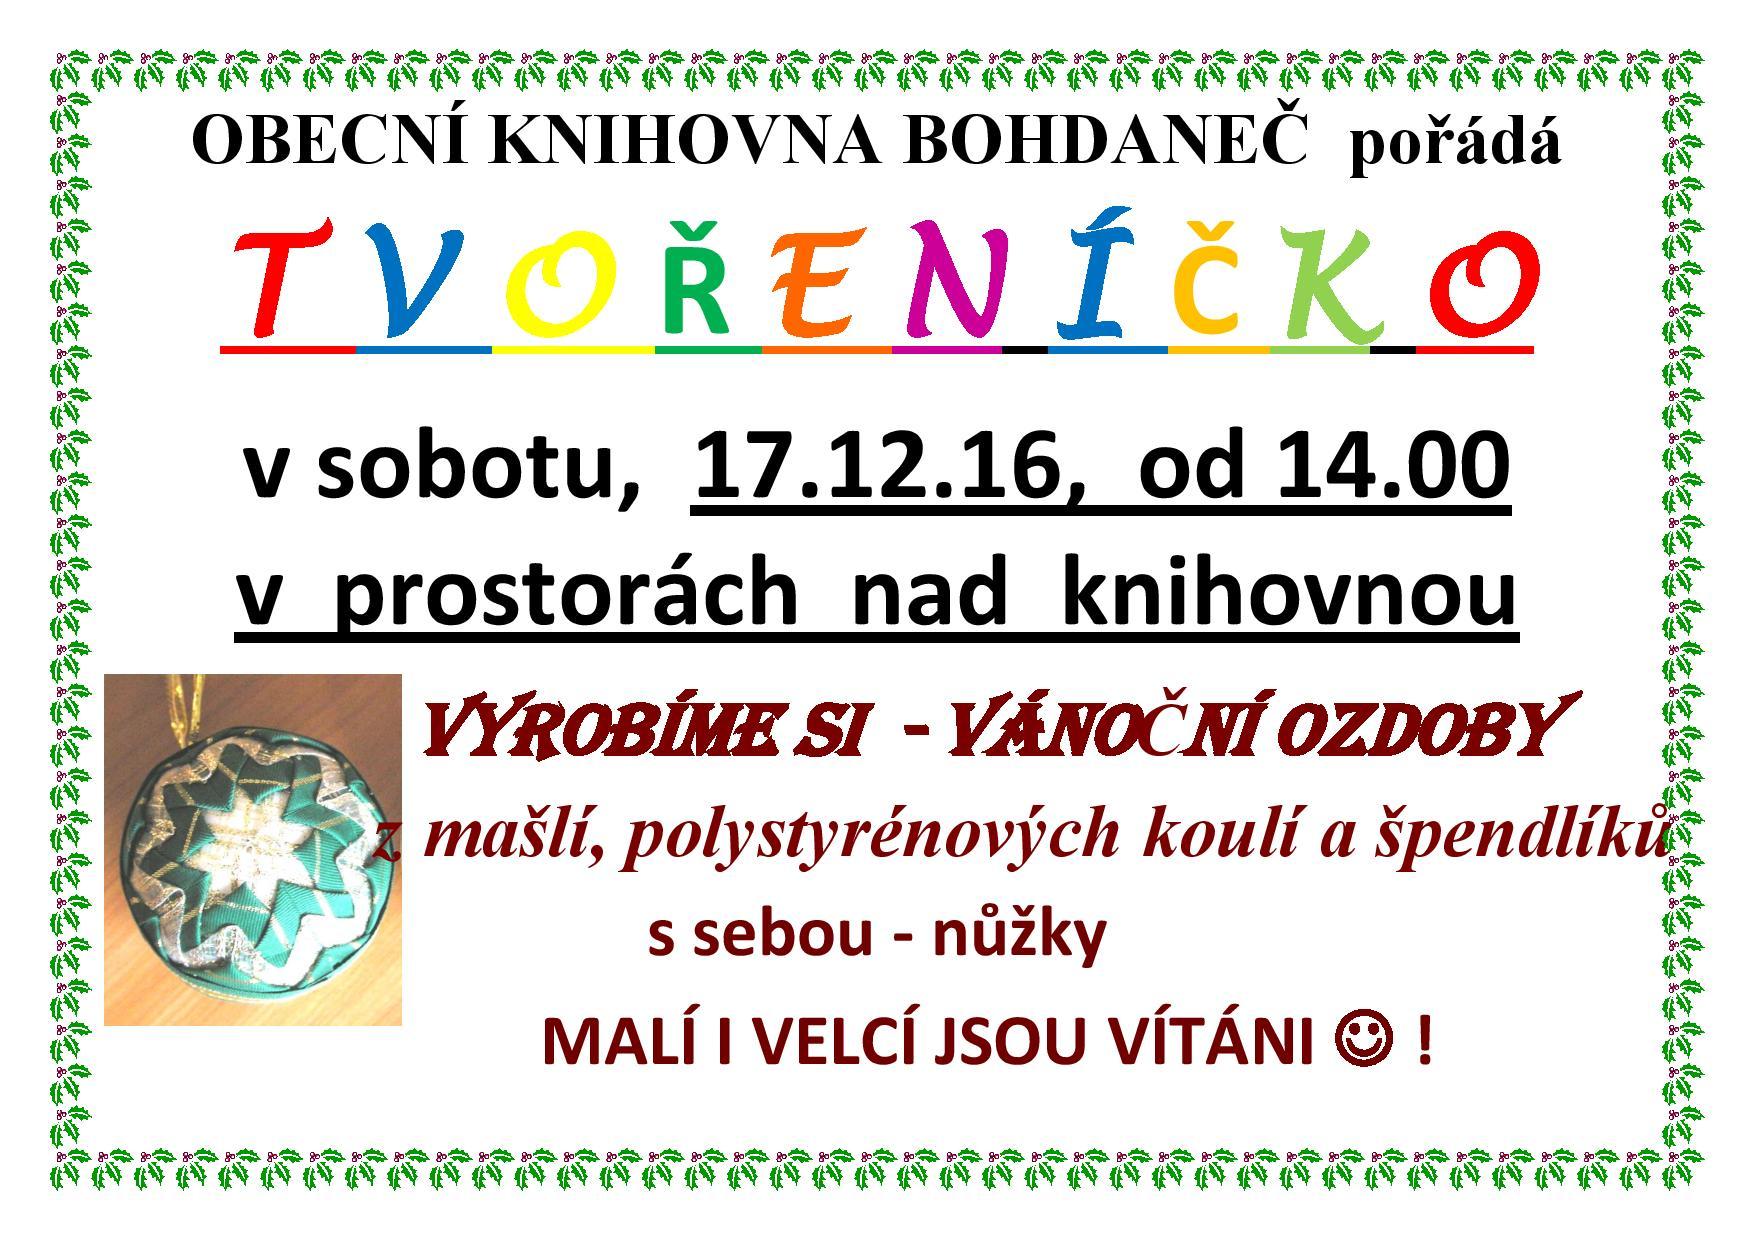 OBRÁZEK : tvoreni_letak_16_artycok-page-001.jpg